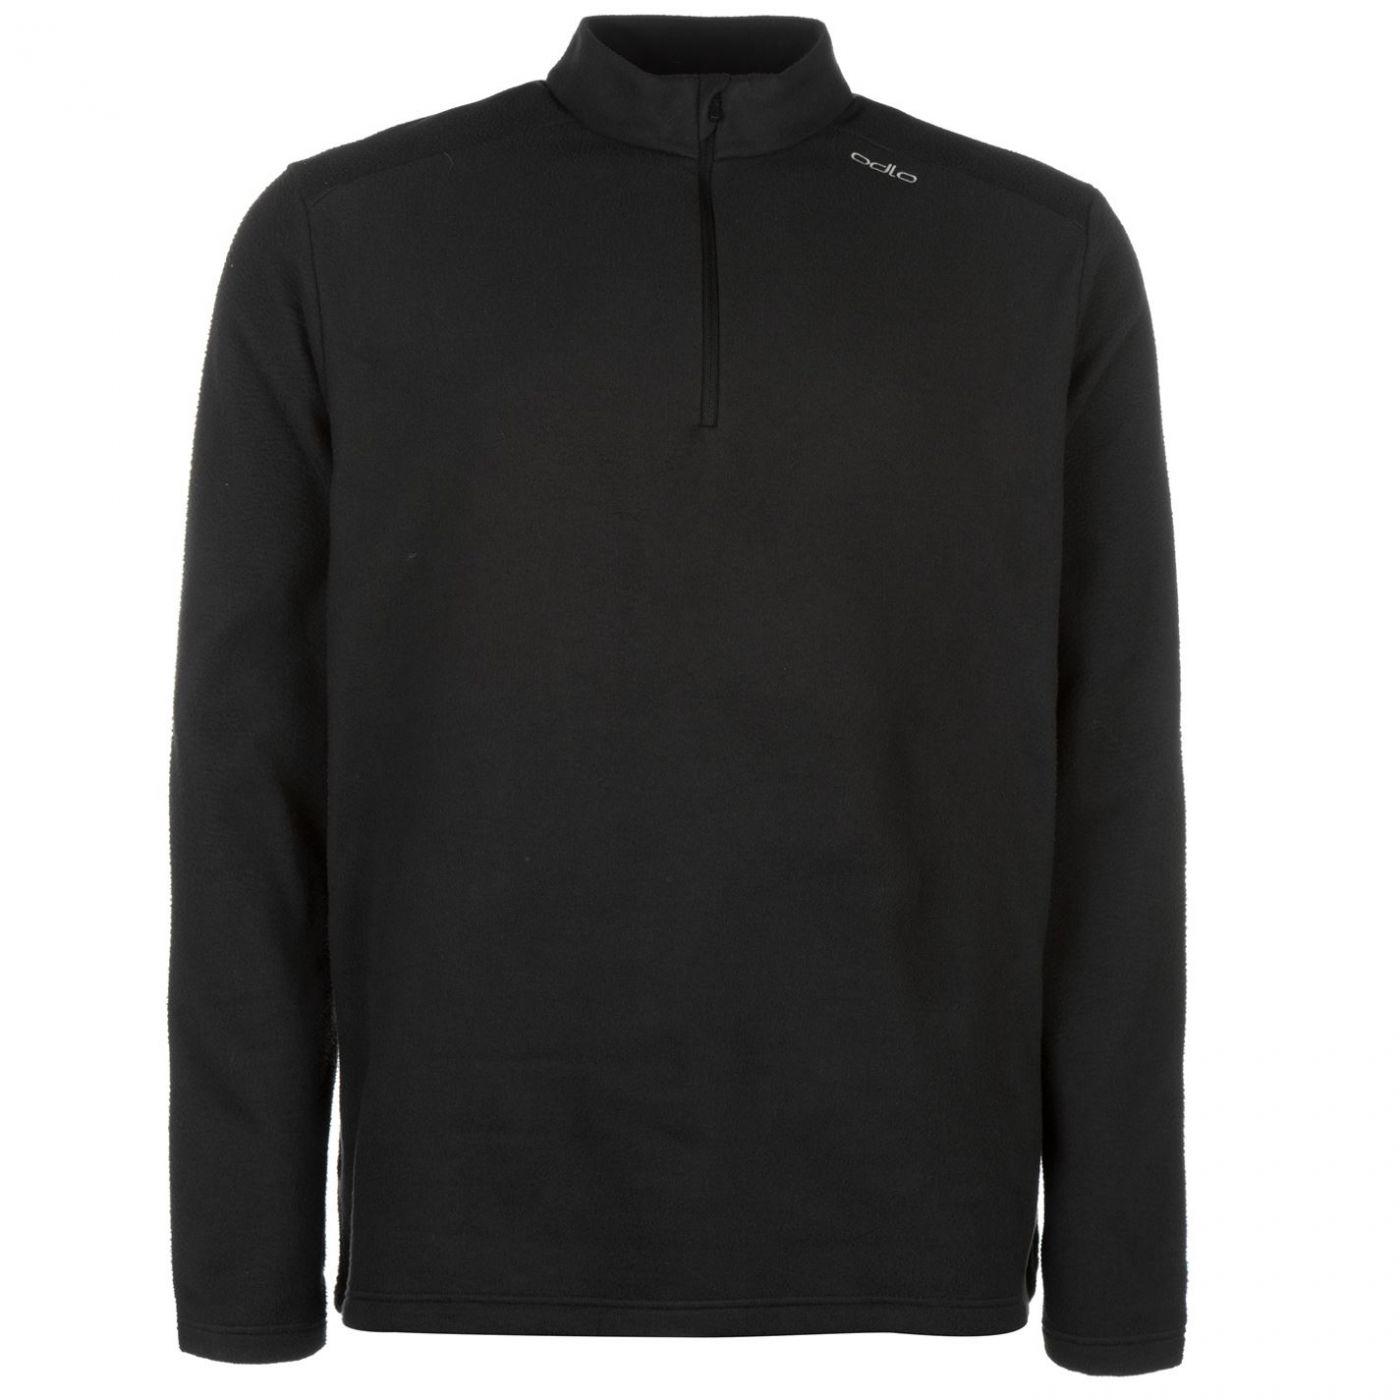 Odlo Orsino Half Zip Fleece Mens